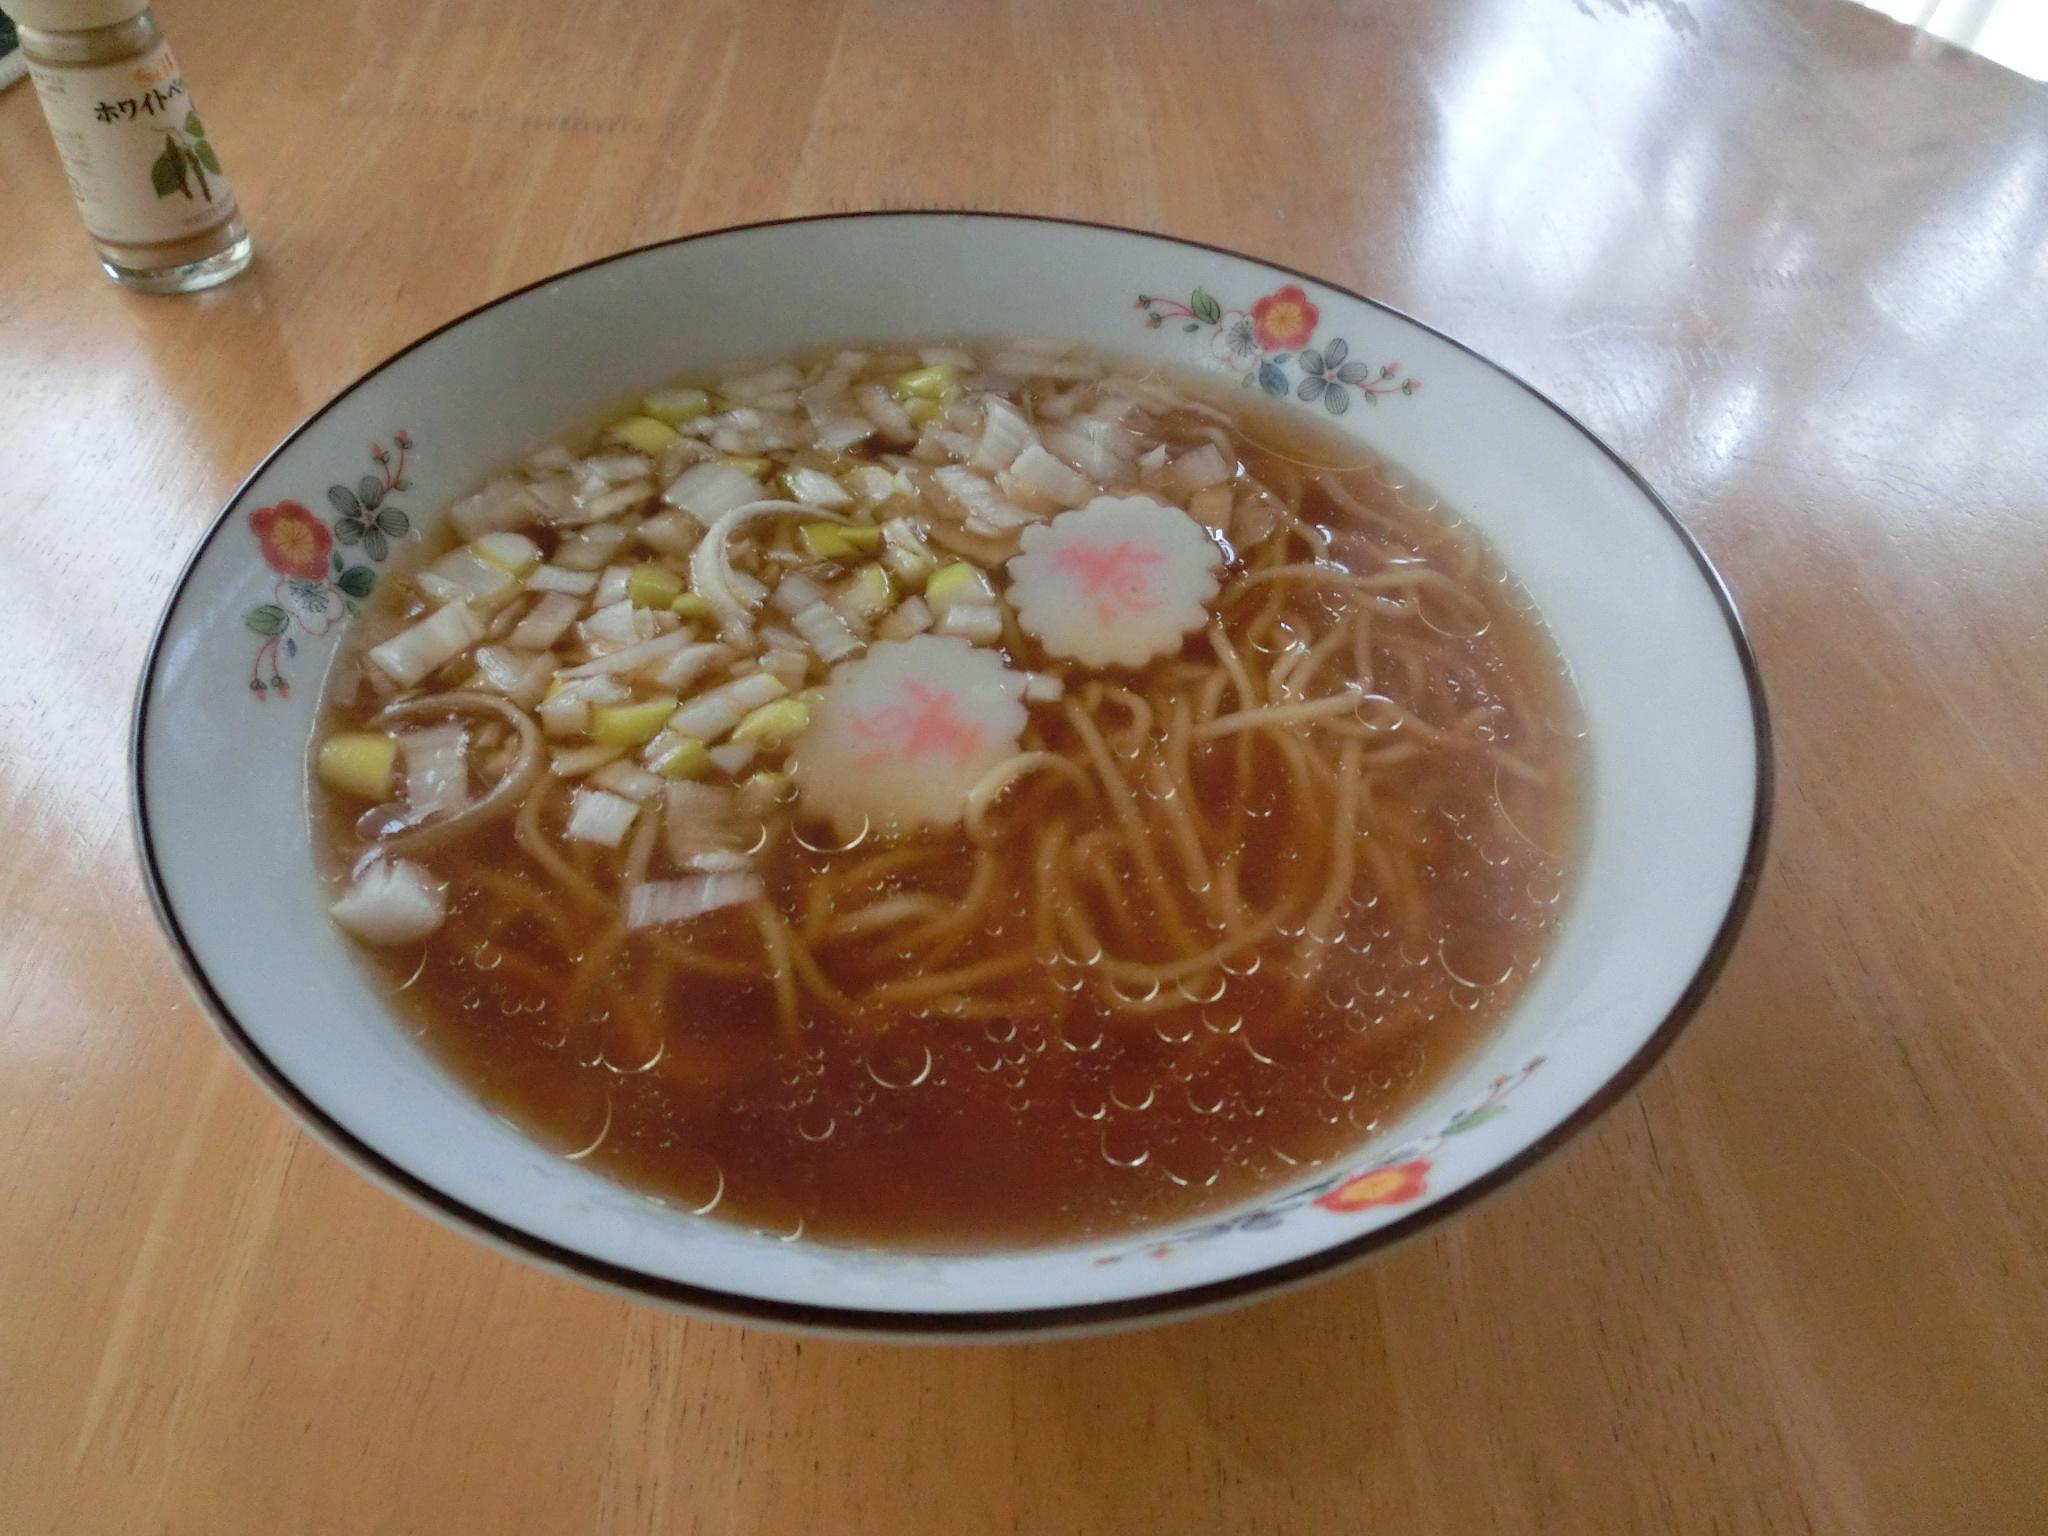 Japanese ramen house made lunch by Hiroshi Fukushima